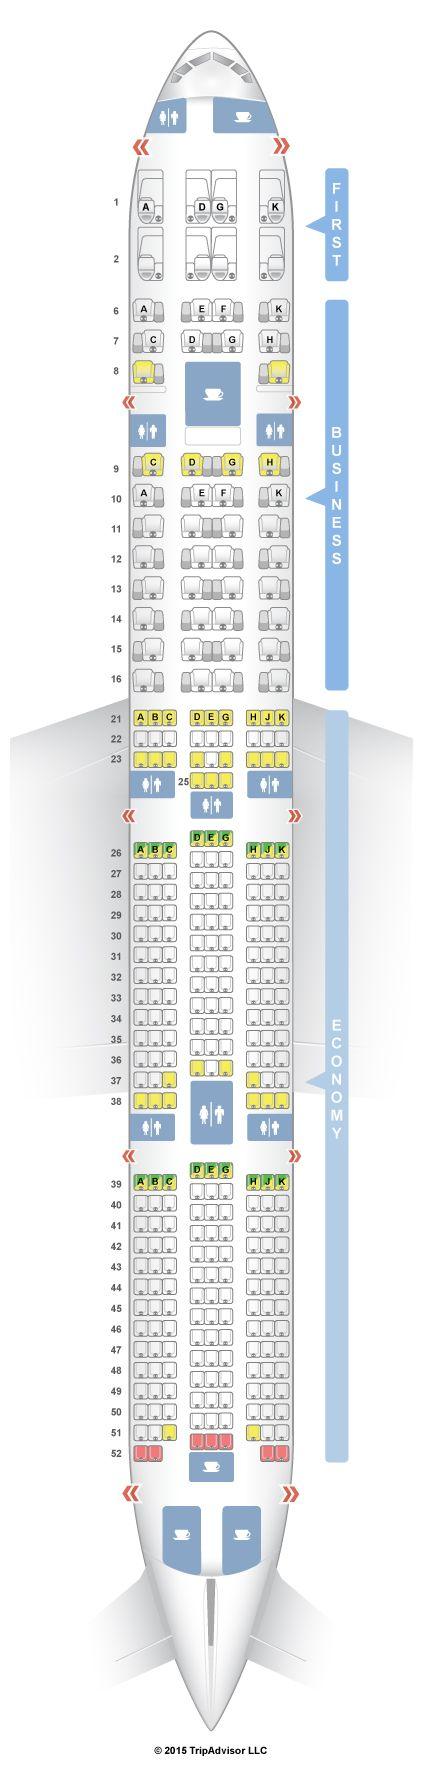 SeatGuru Seat Map Garuda Indonesia Boeing 777-300ER (77W)